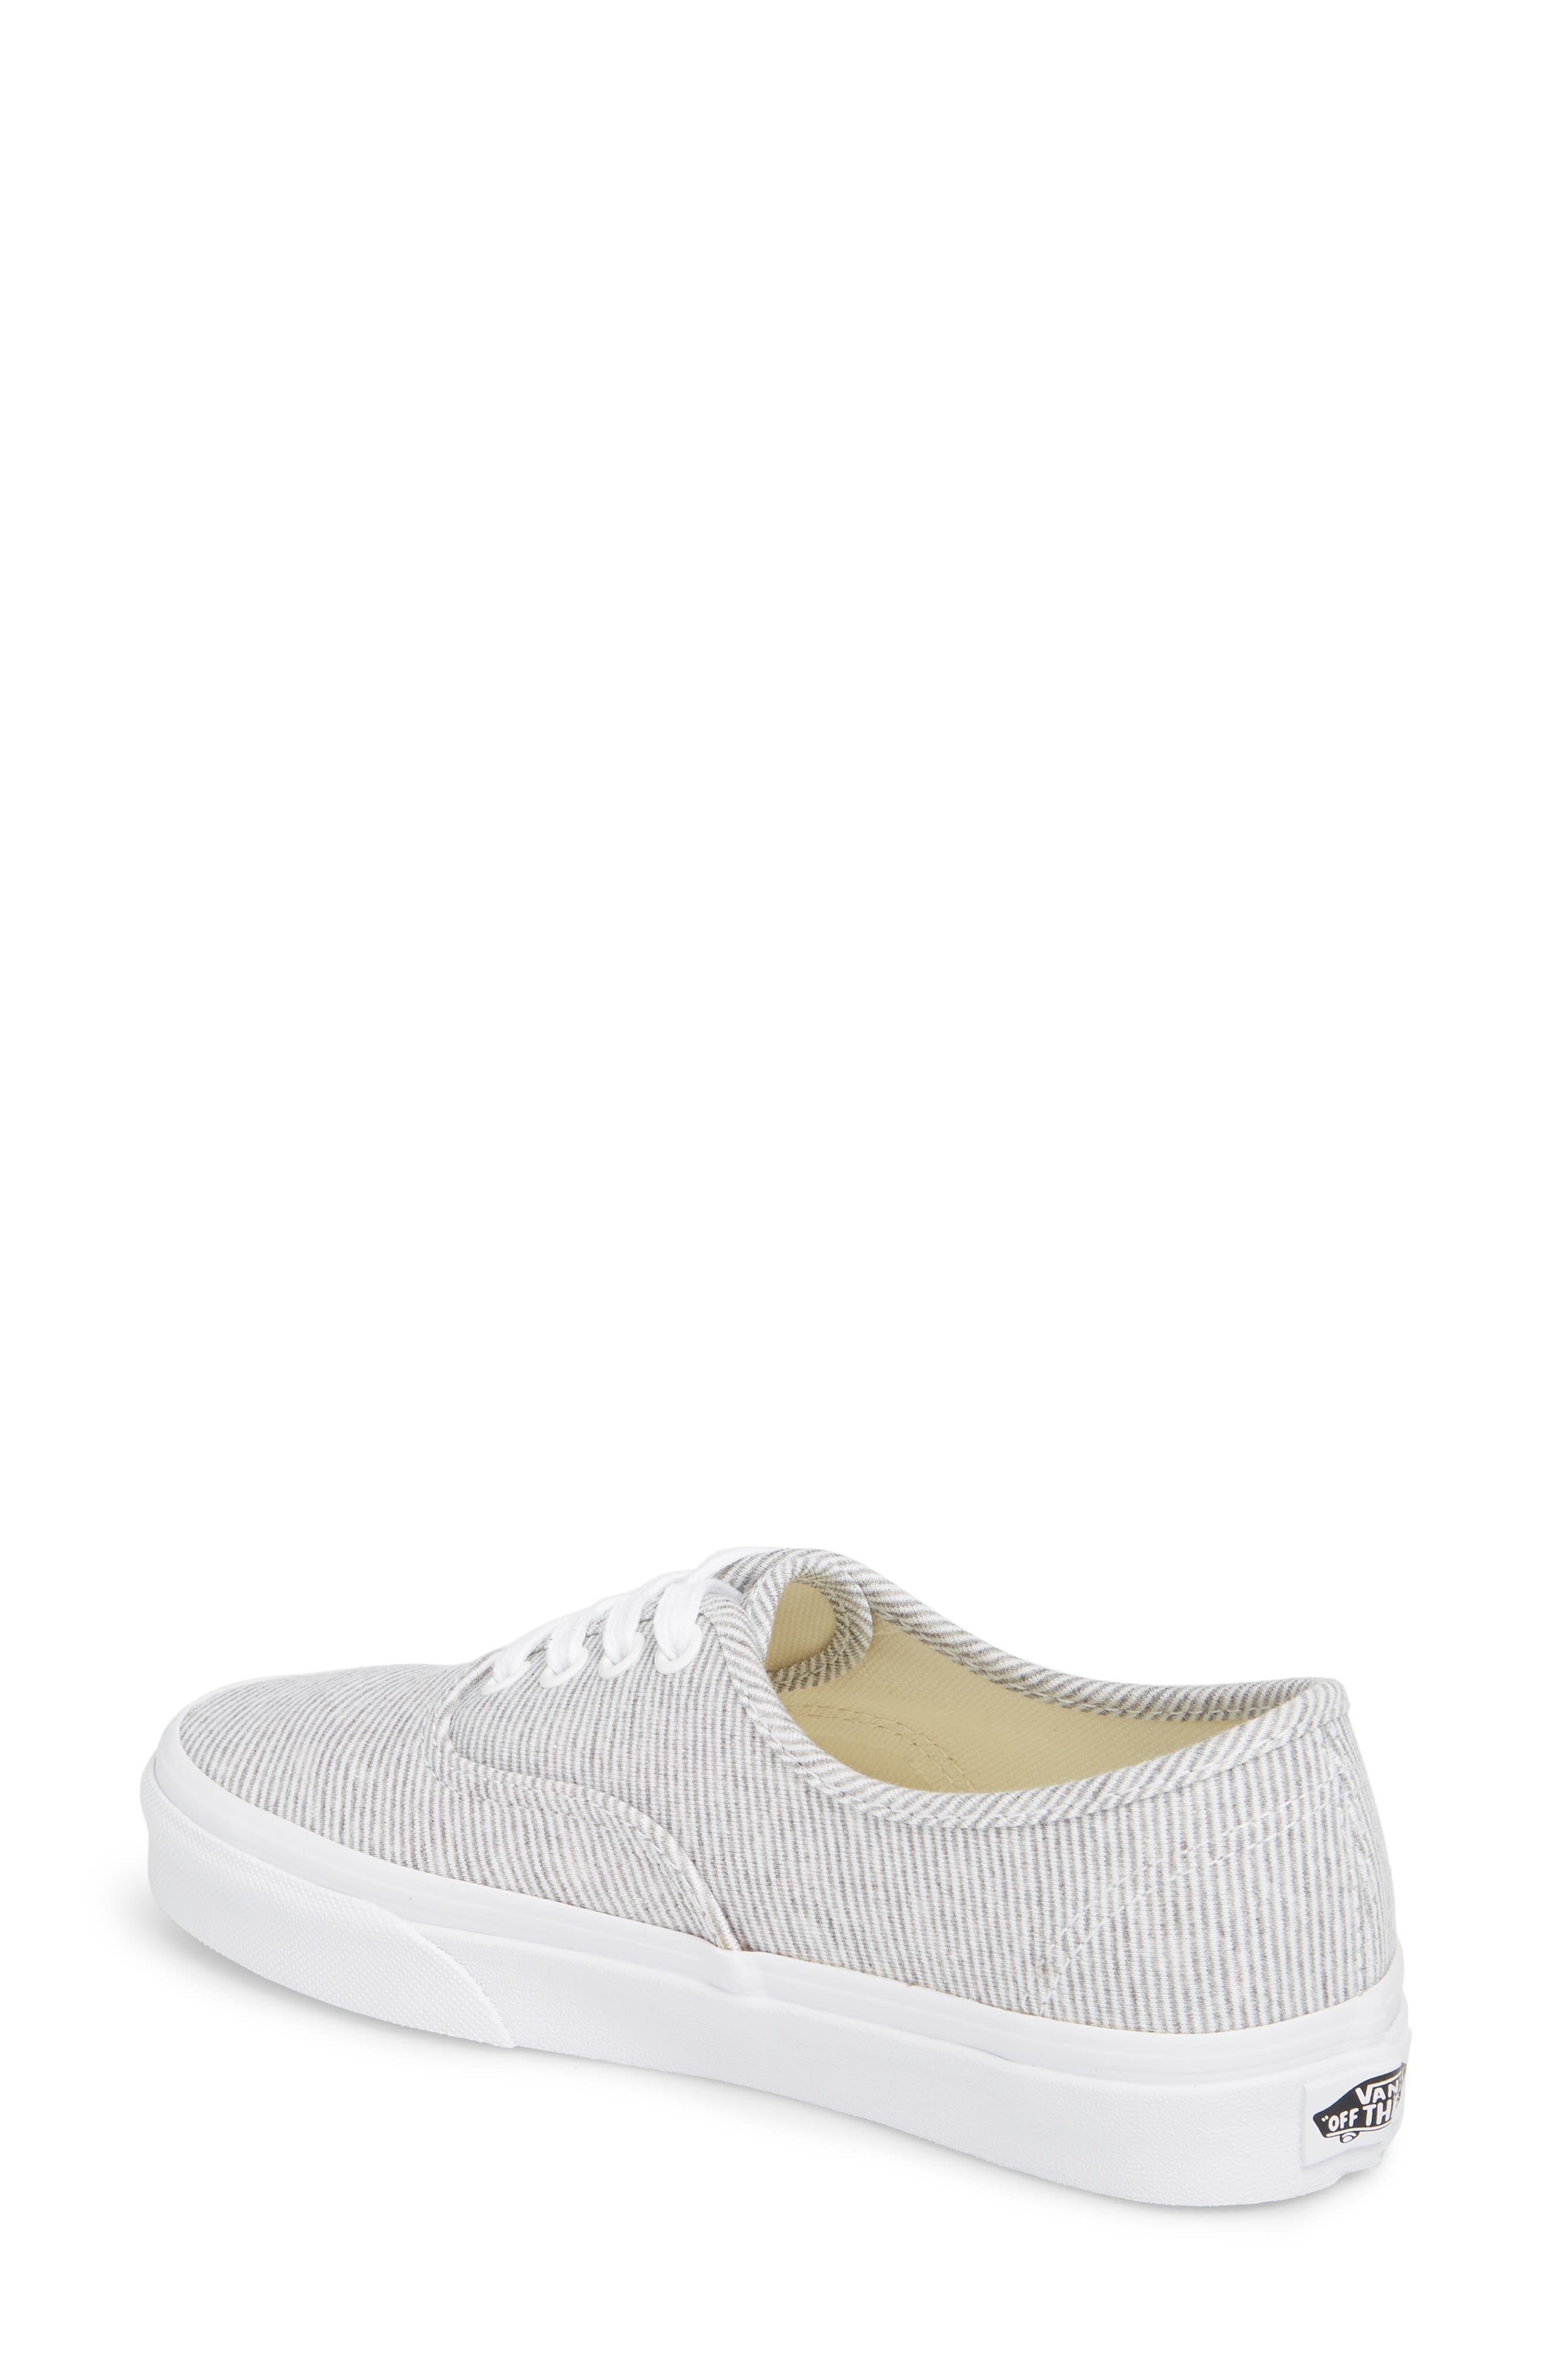 ,                             'Authentic' Sneaker,                             Alternate thumbnail 130, color,                             022